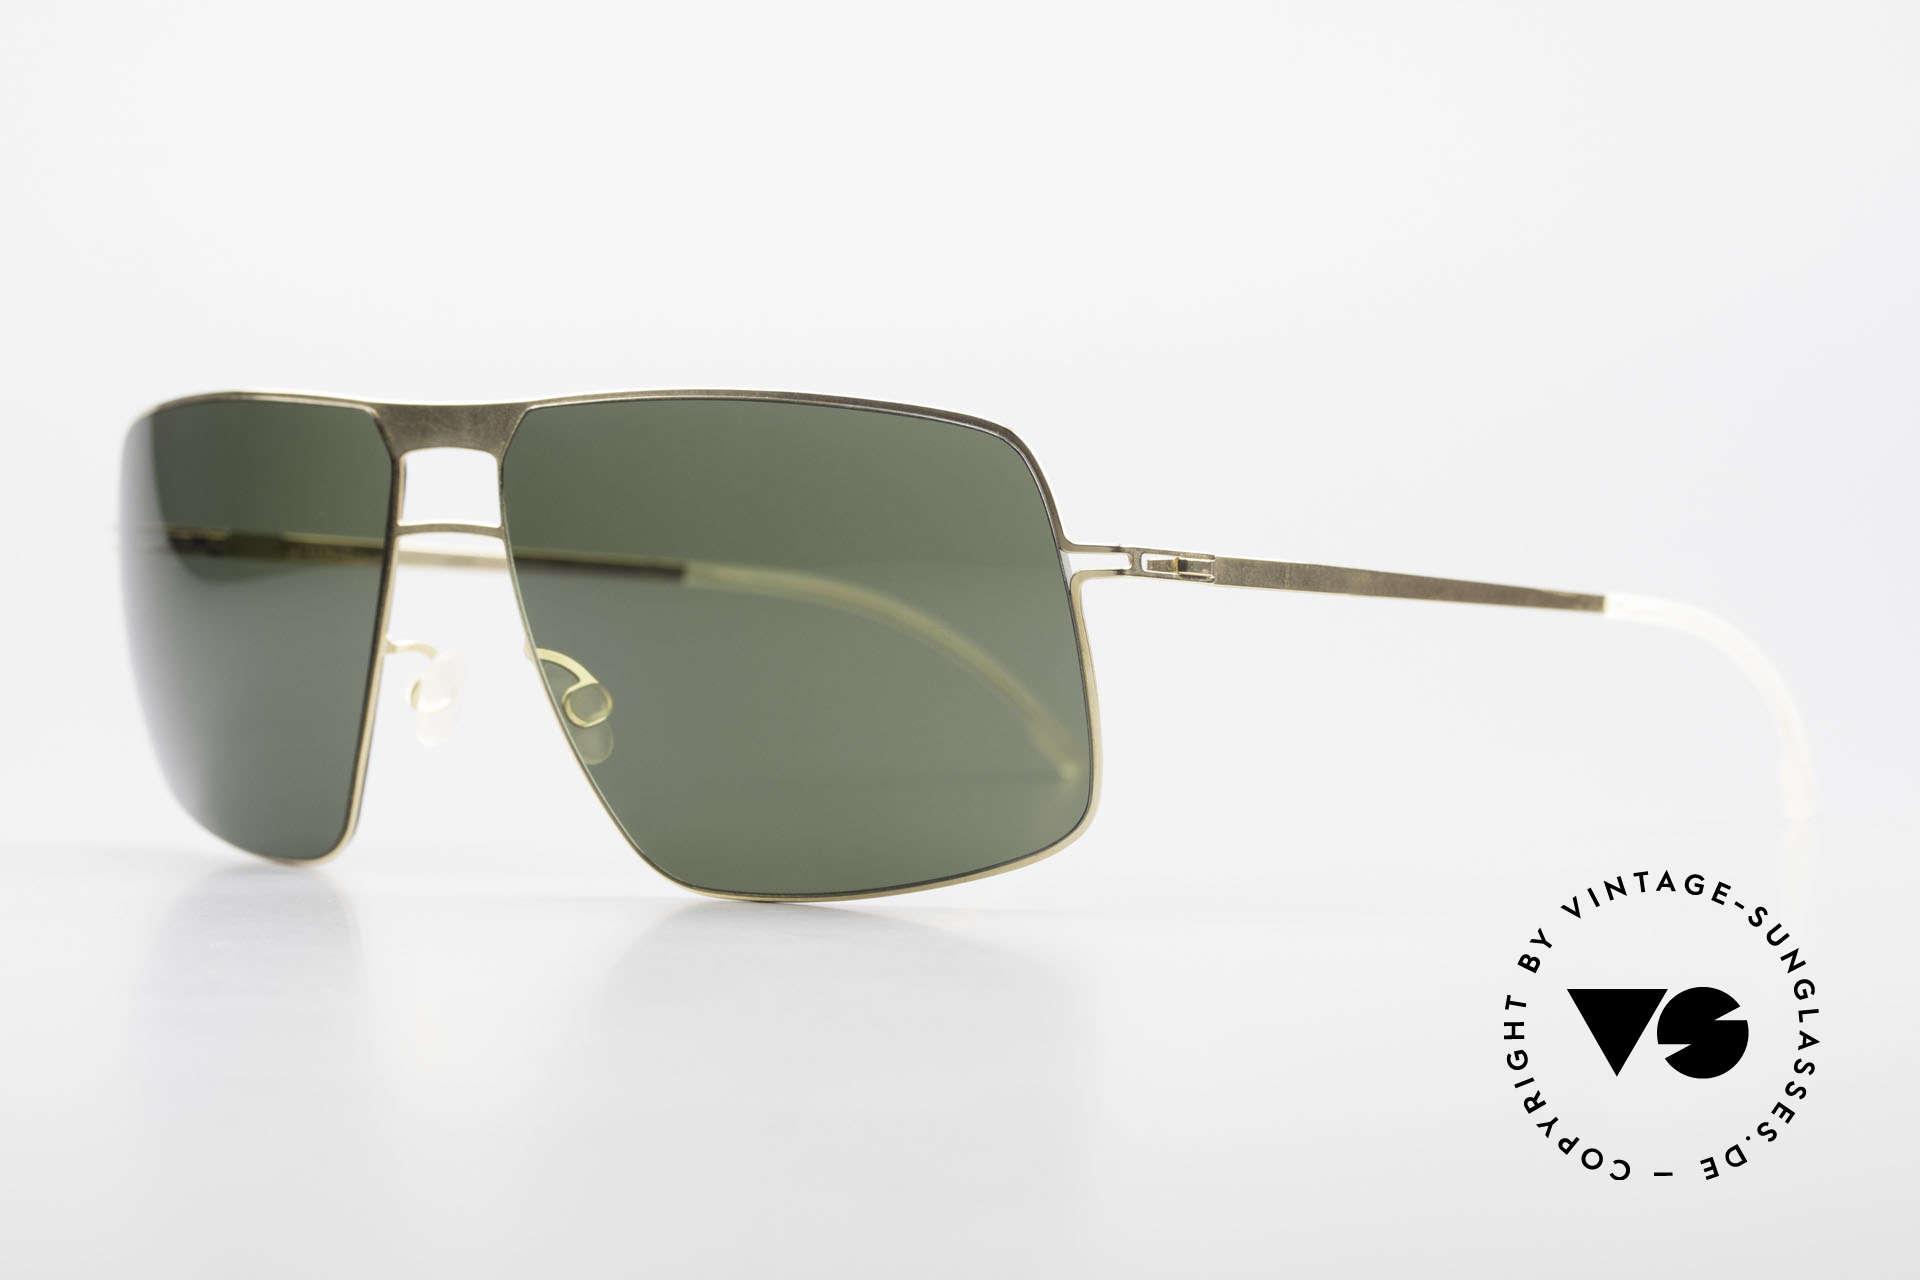 Mykita Leif Designer Shades Zeiss Lenses, Model Lite Sun Leif Glossygold, Zeiss green-solid, 62/15, Made for Men